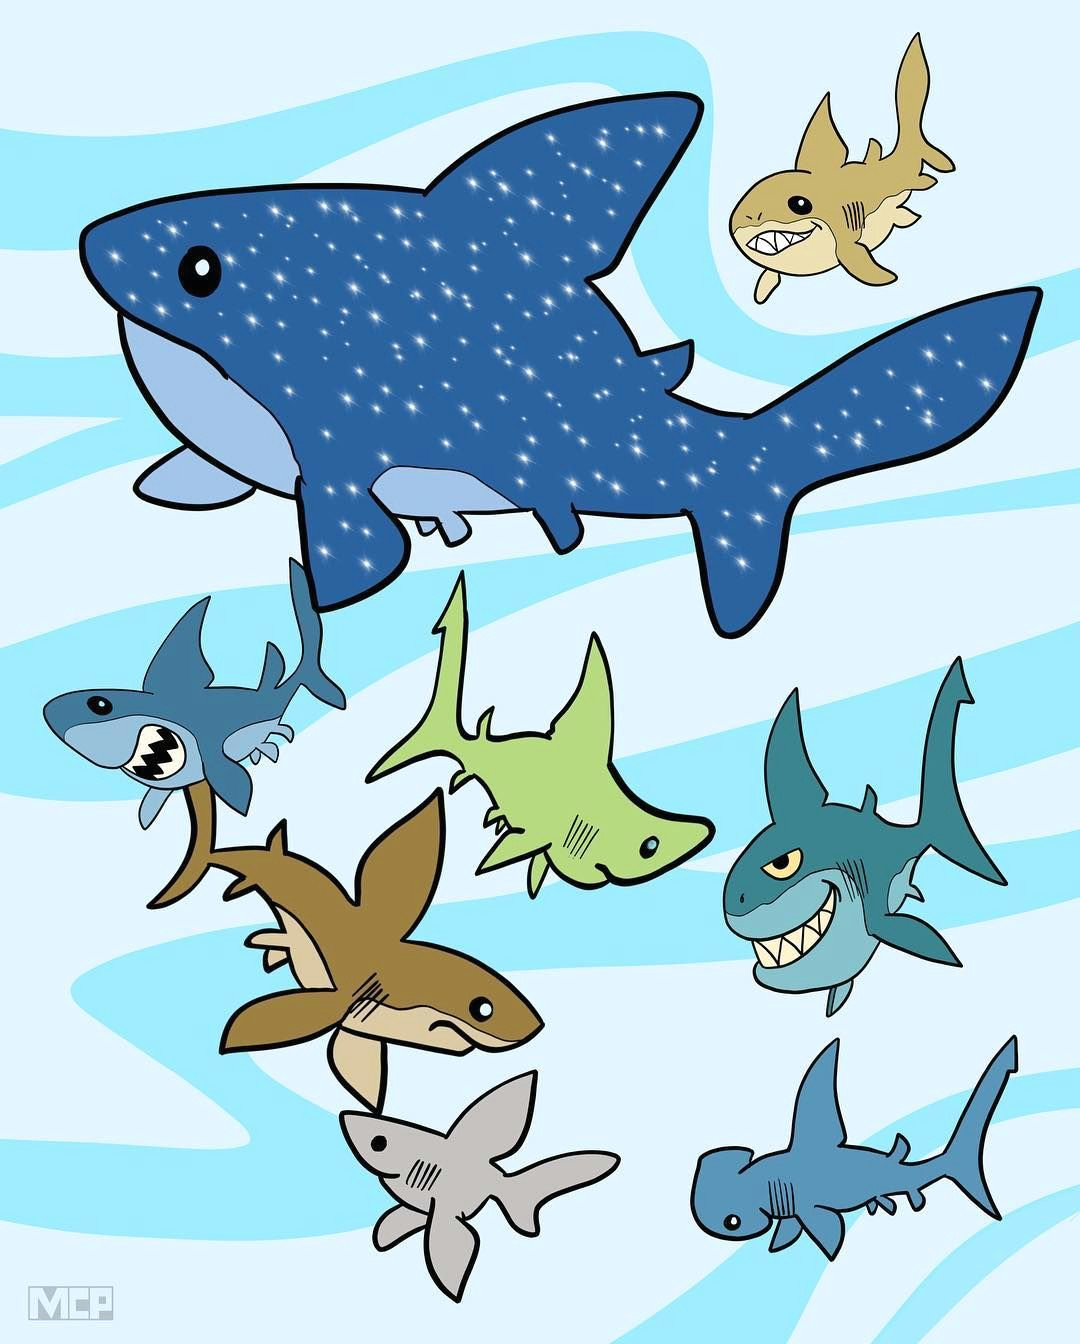 a shiver of sharks shark tiburon requin haifisch sharks shaaark